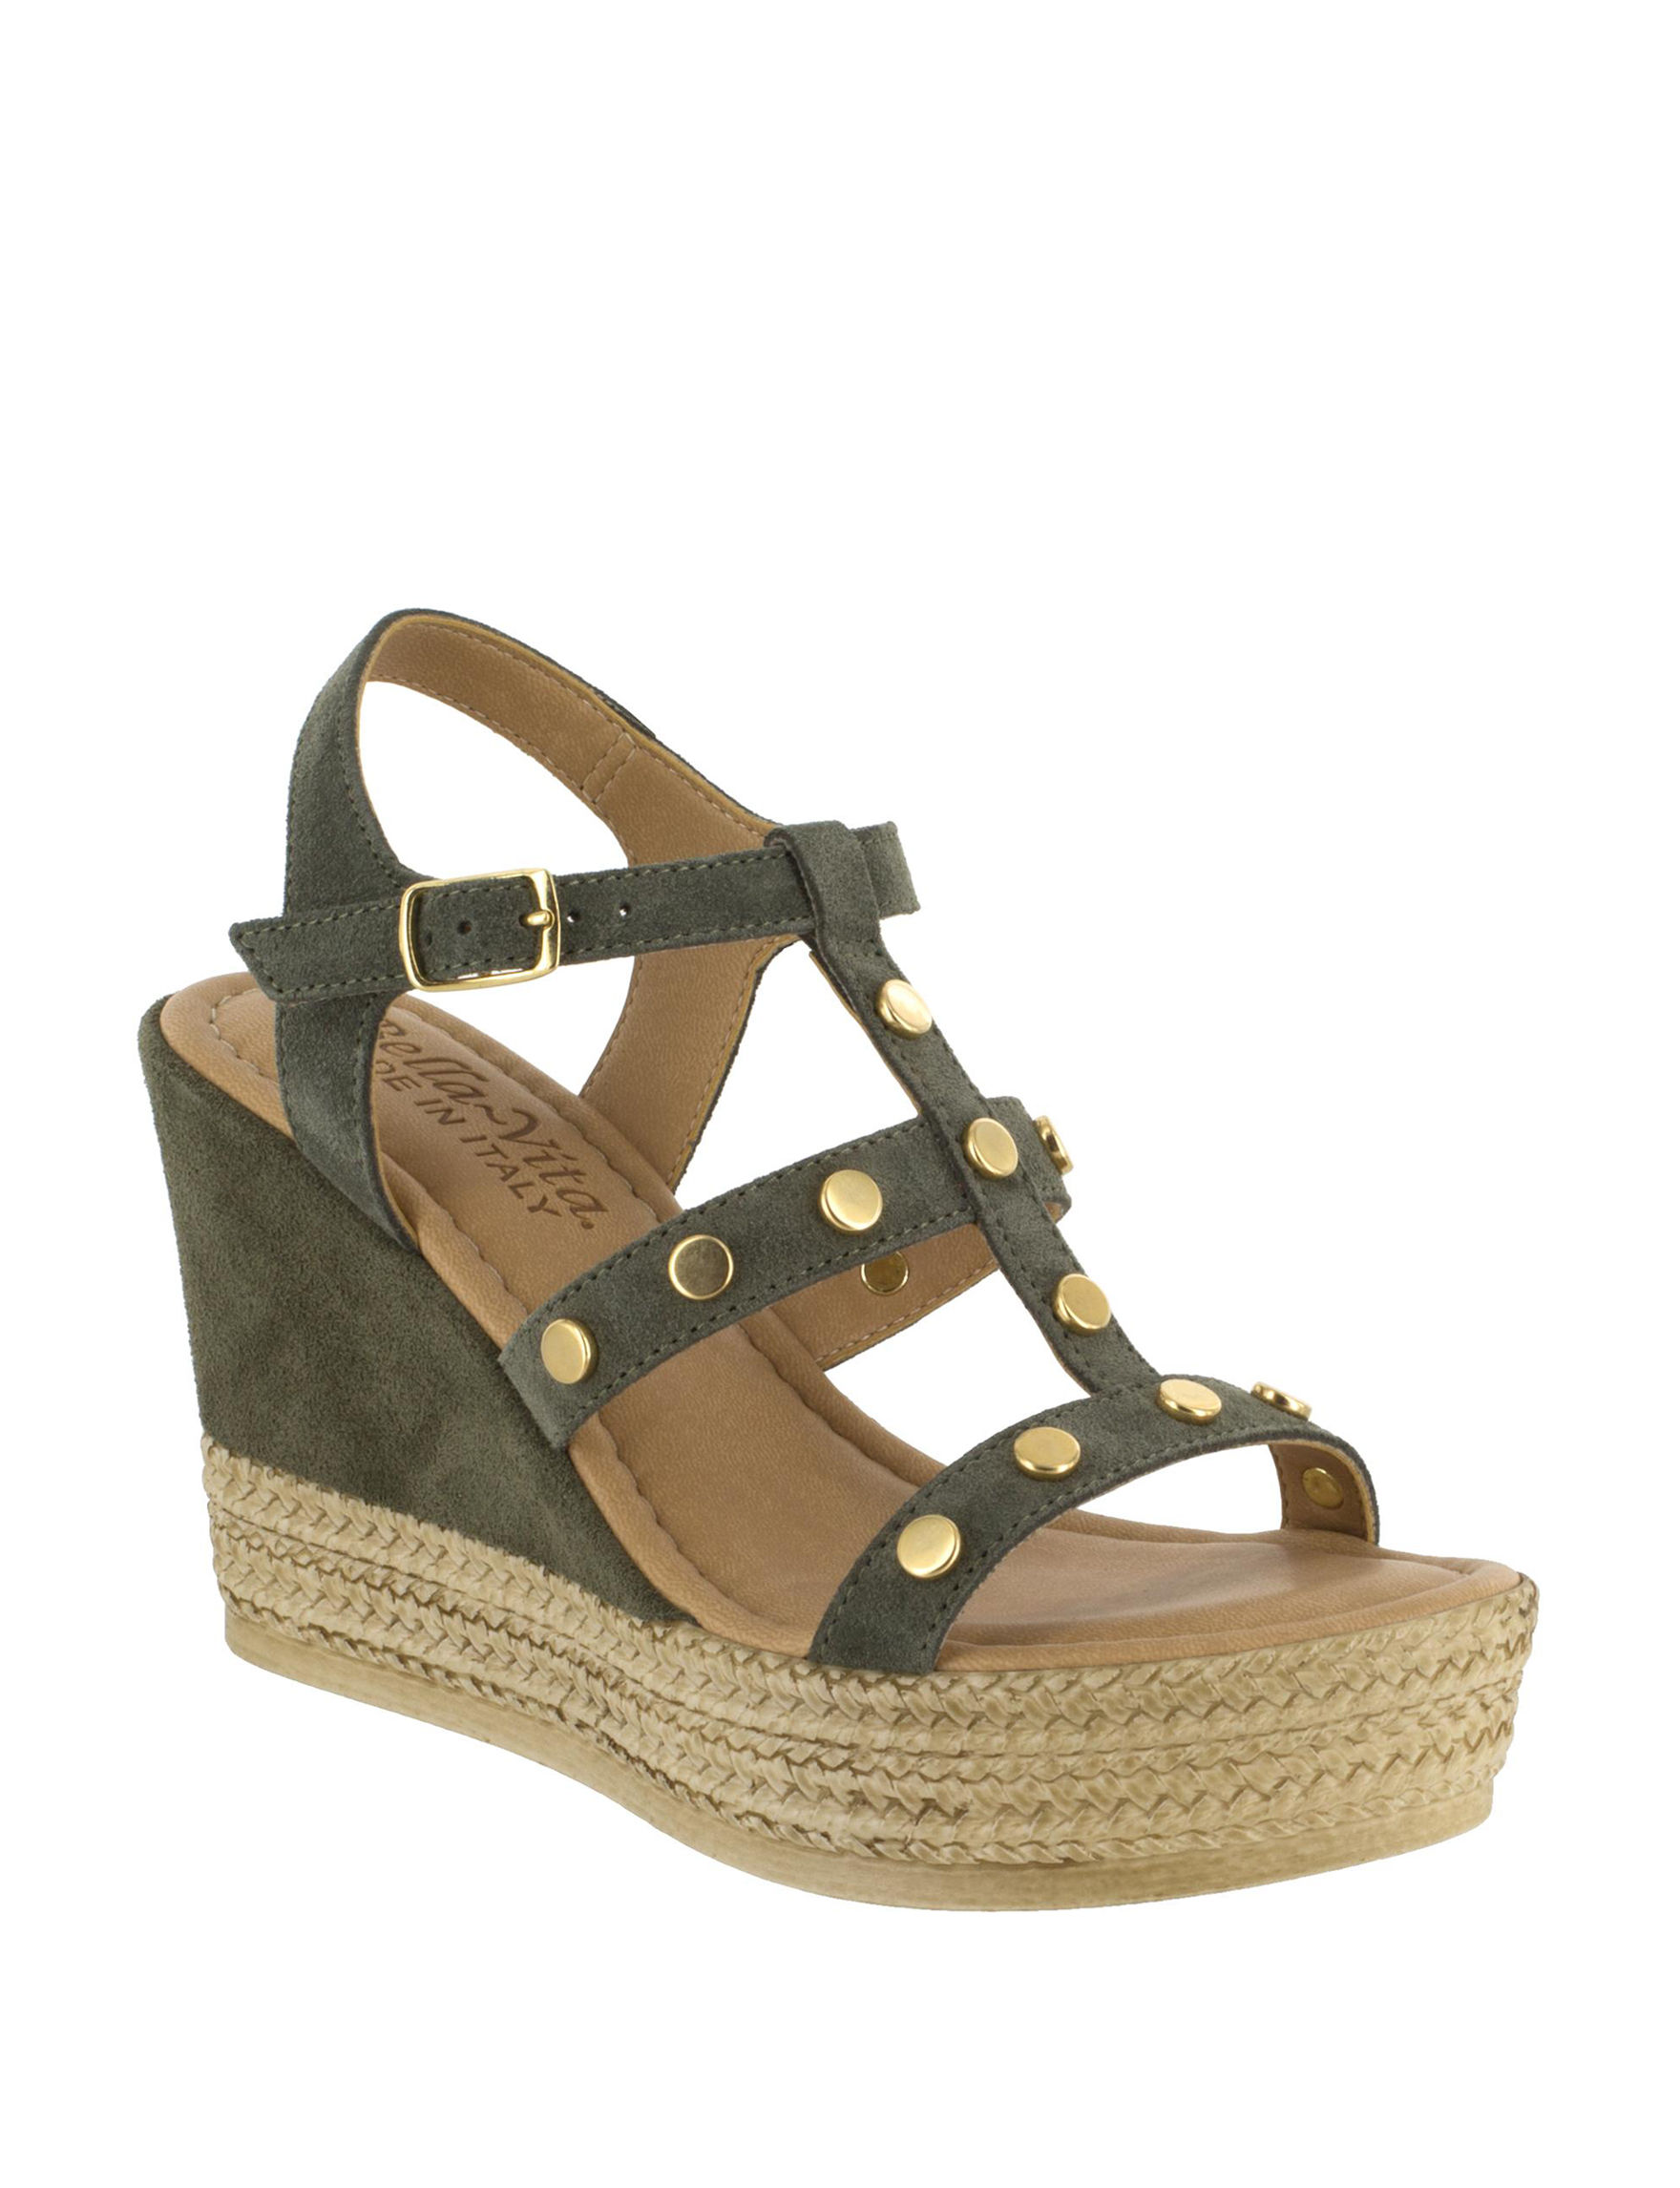 Bella Vita Olive Espadrille Wedge Sandals